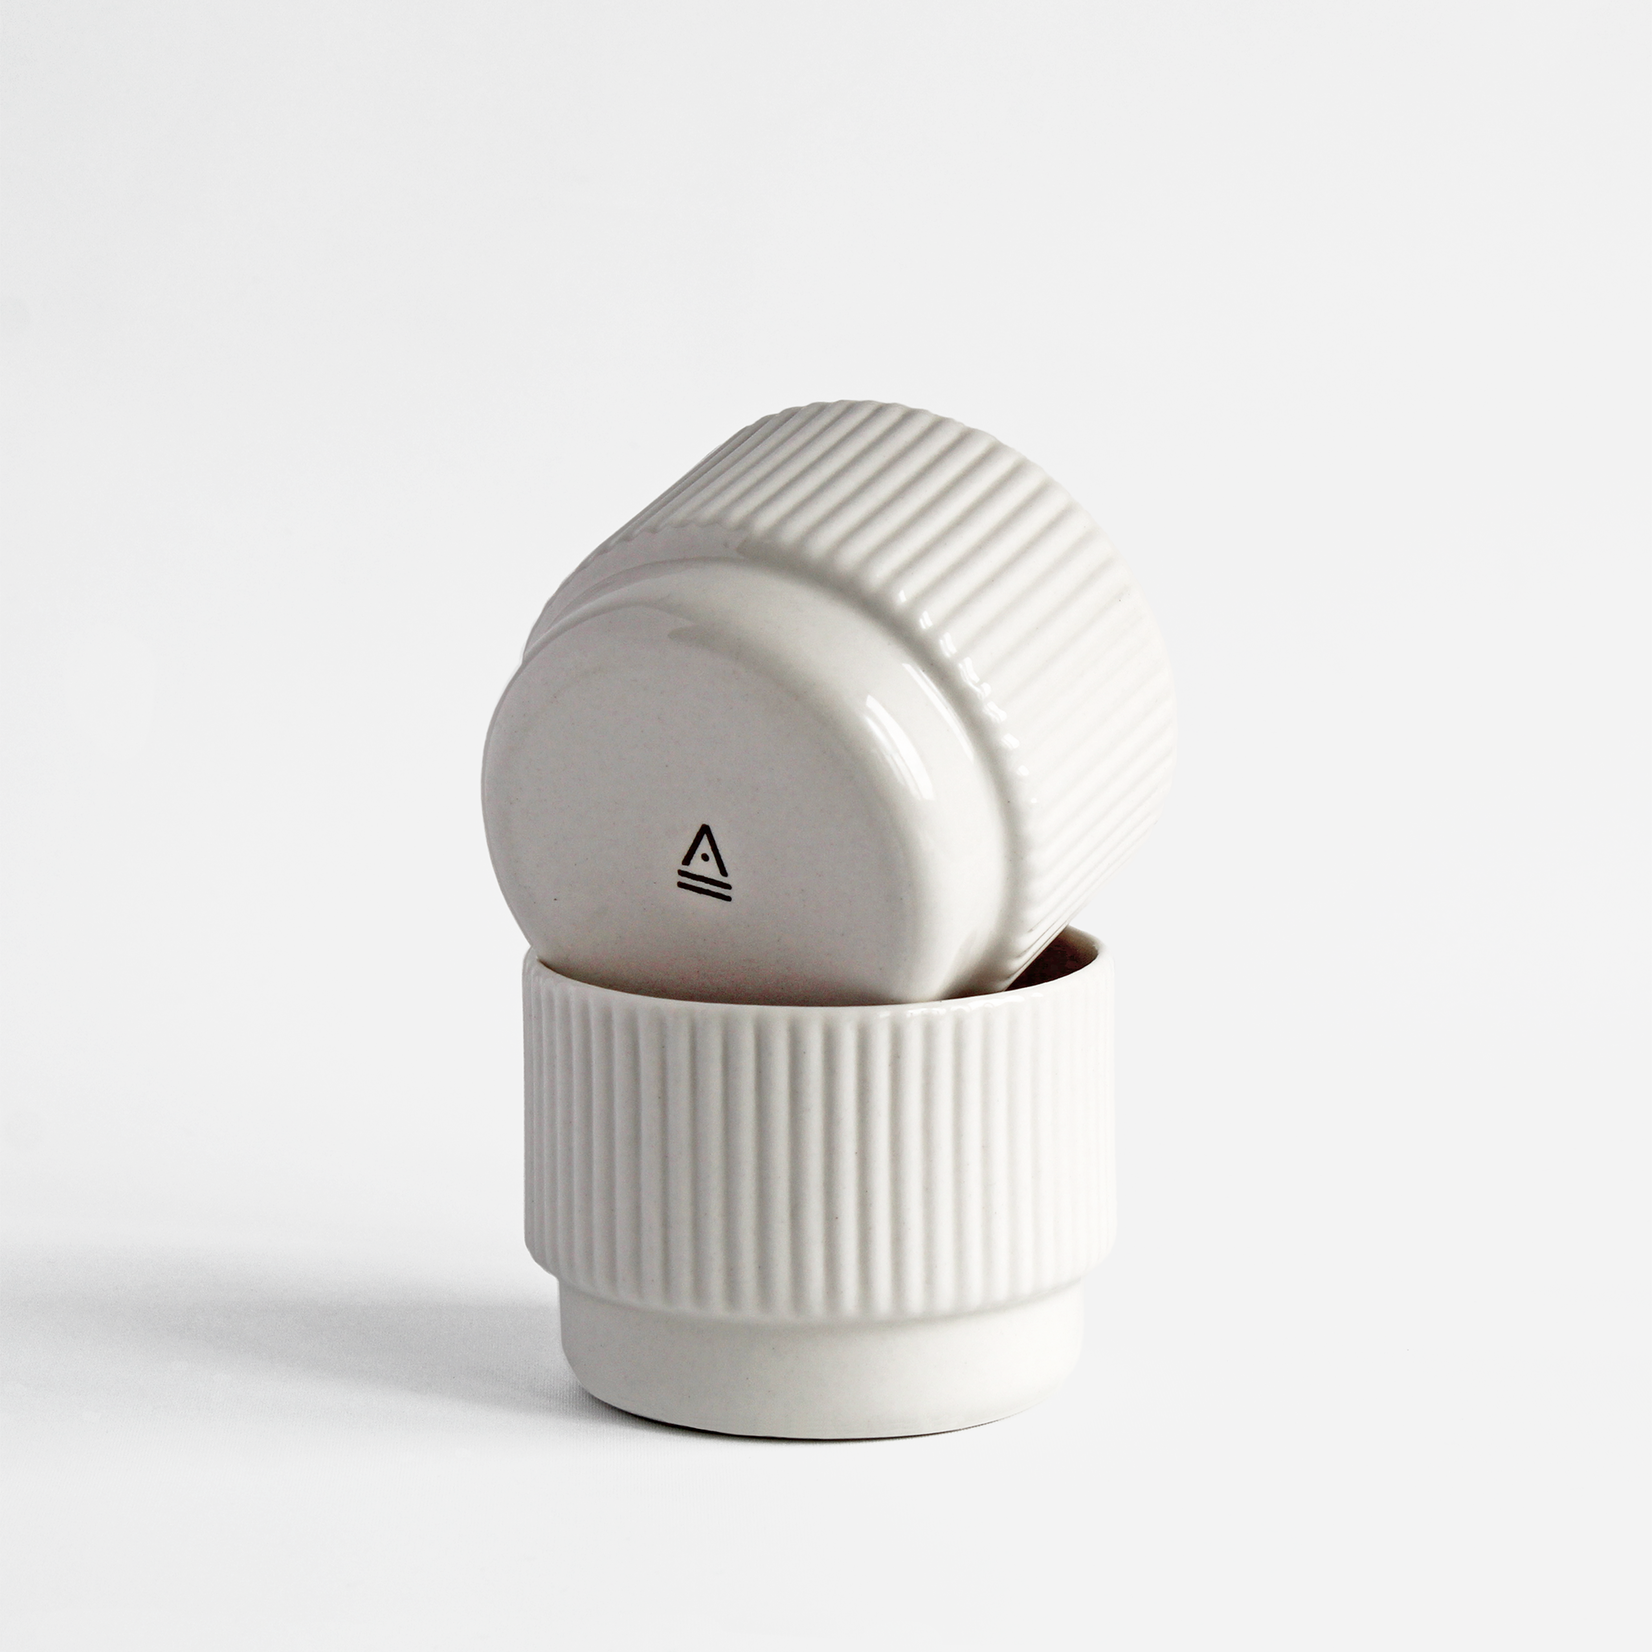 Archive Studio Archive Studio Handmade Cappuccino Cup Ribbed White